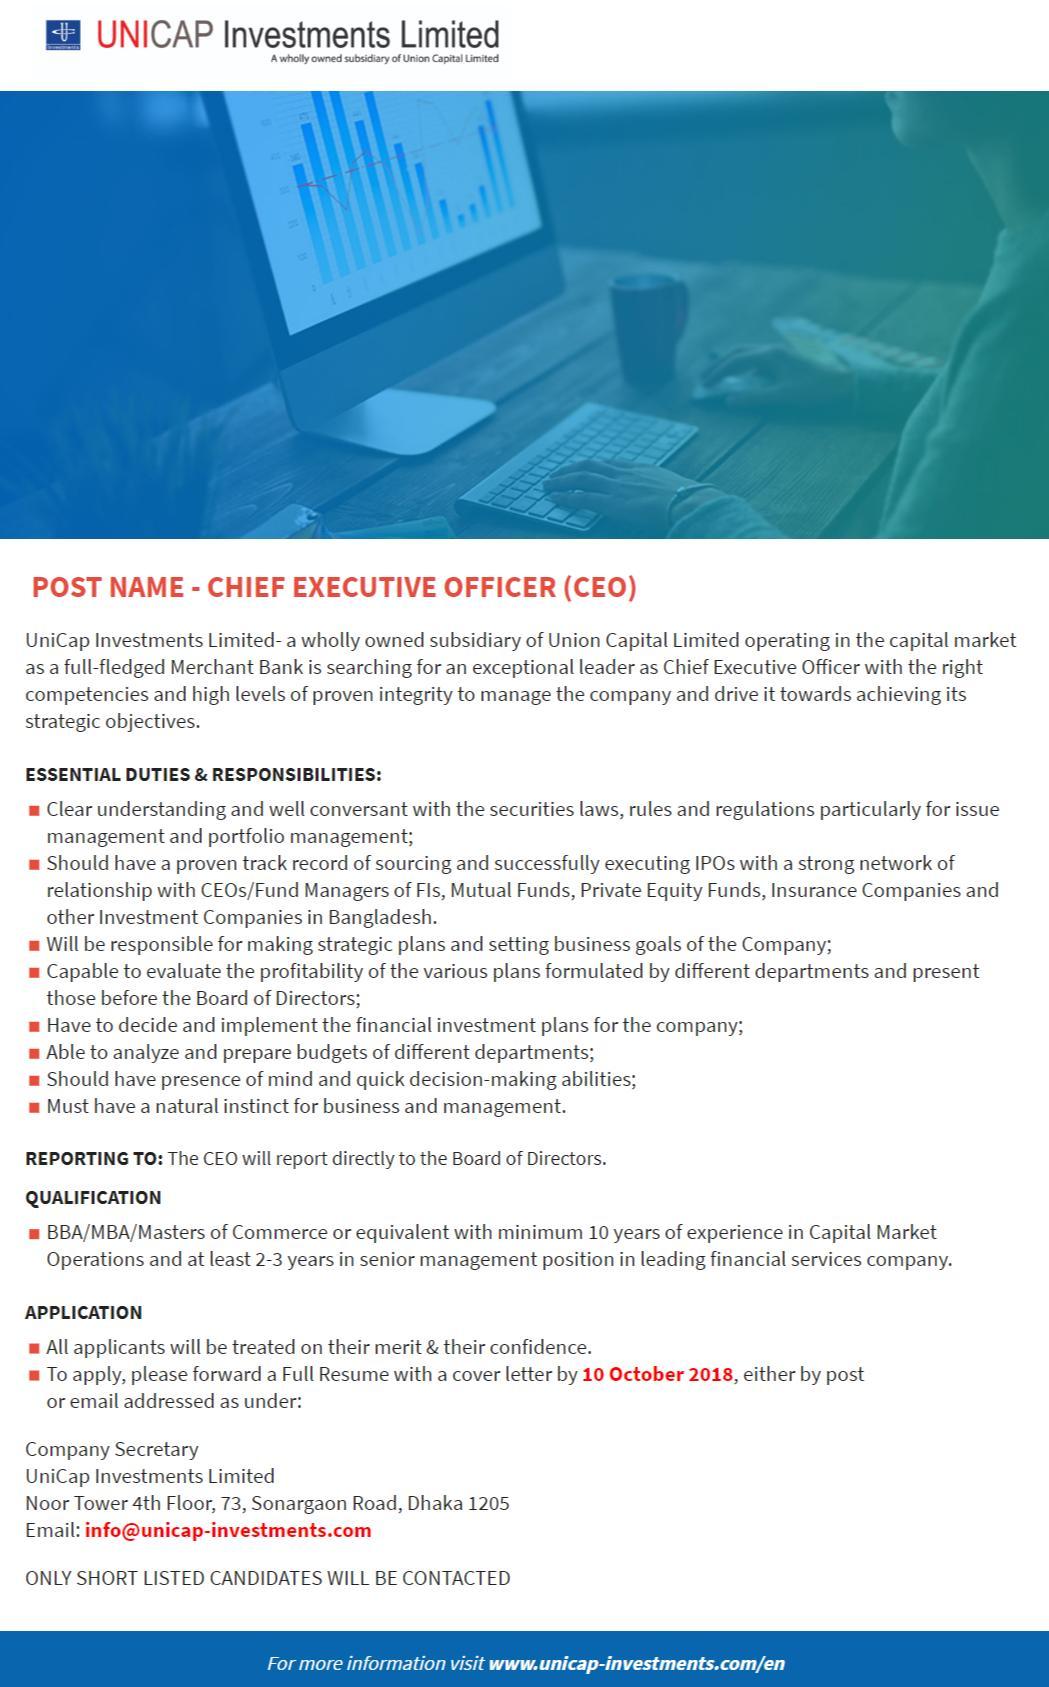 UniCap Investments Limited Job Circular